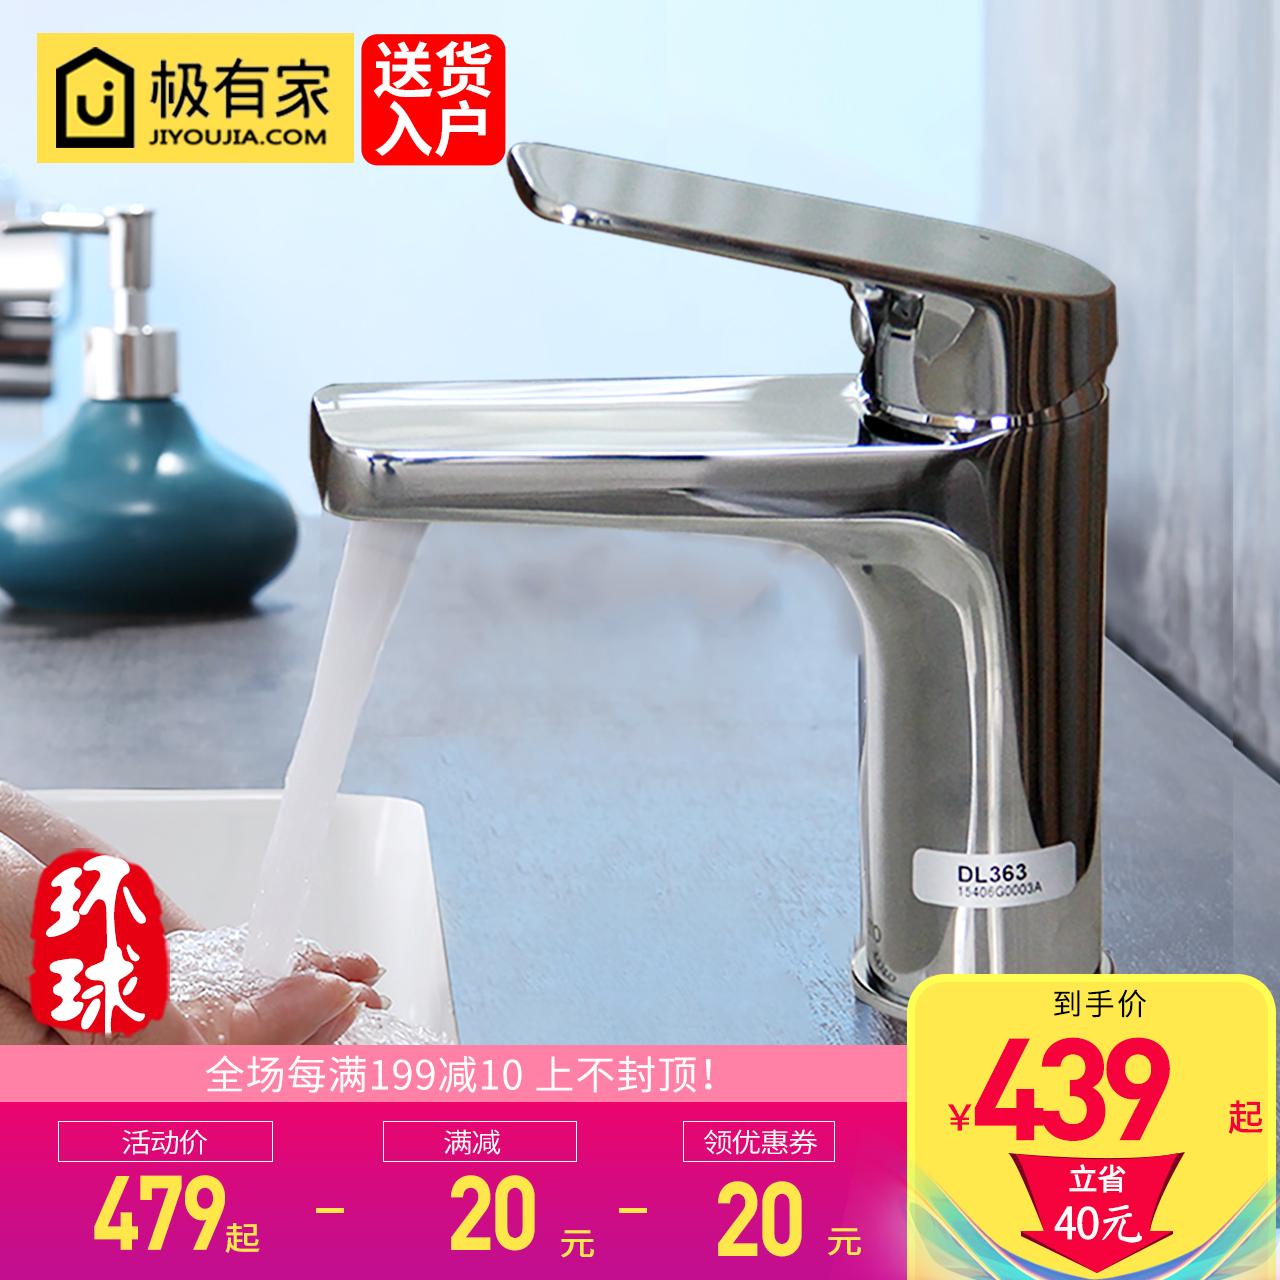 USD 251.98] TOTO DL363 desk washbasin with single hole single handle ...